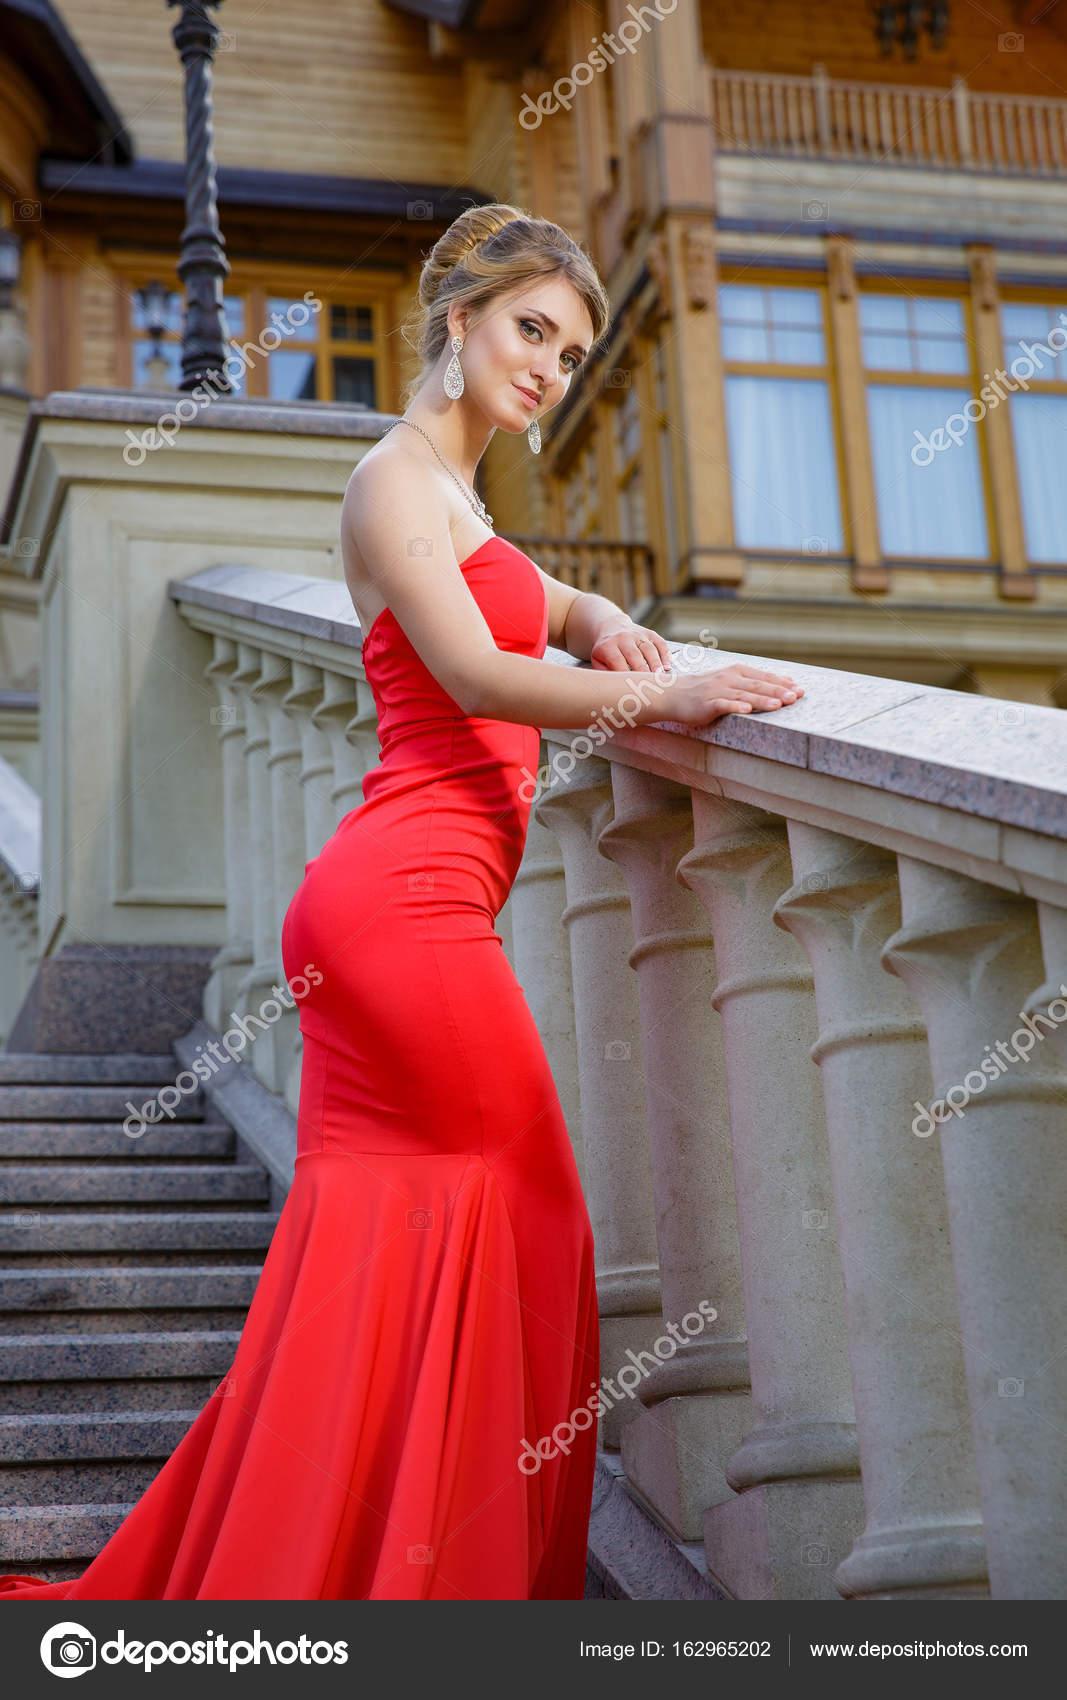 Luxurious Red Dress